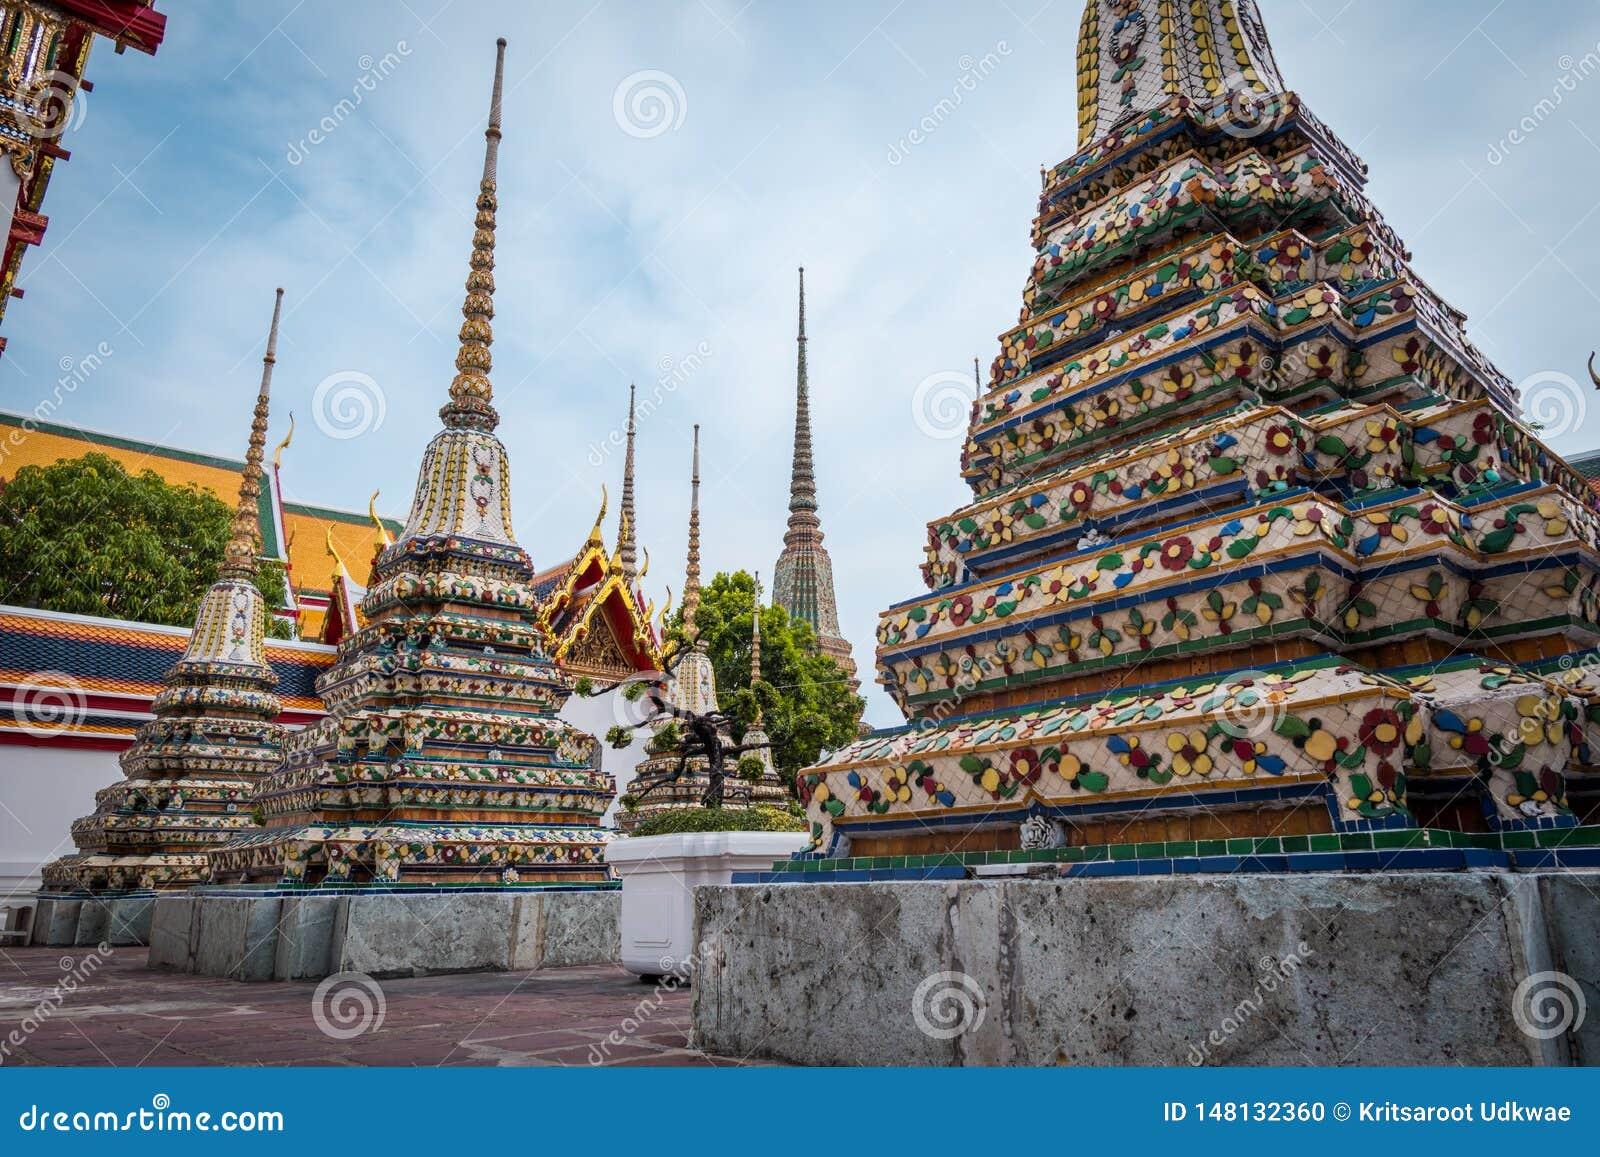 Wat Phra Chetuphon Wat Pho或Wat Phra Chetuphon Vimolmangklararm Rajwaramahaviharn